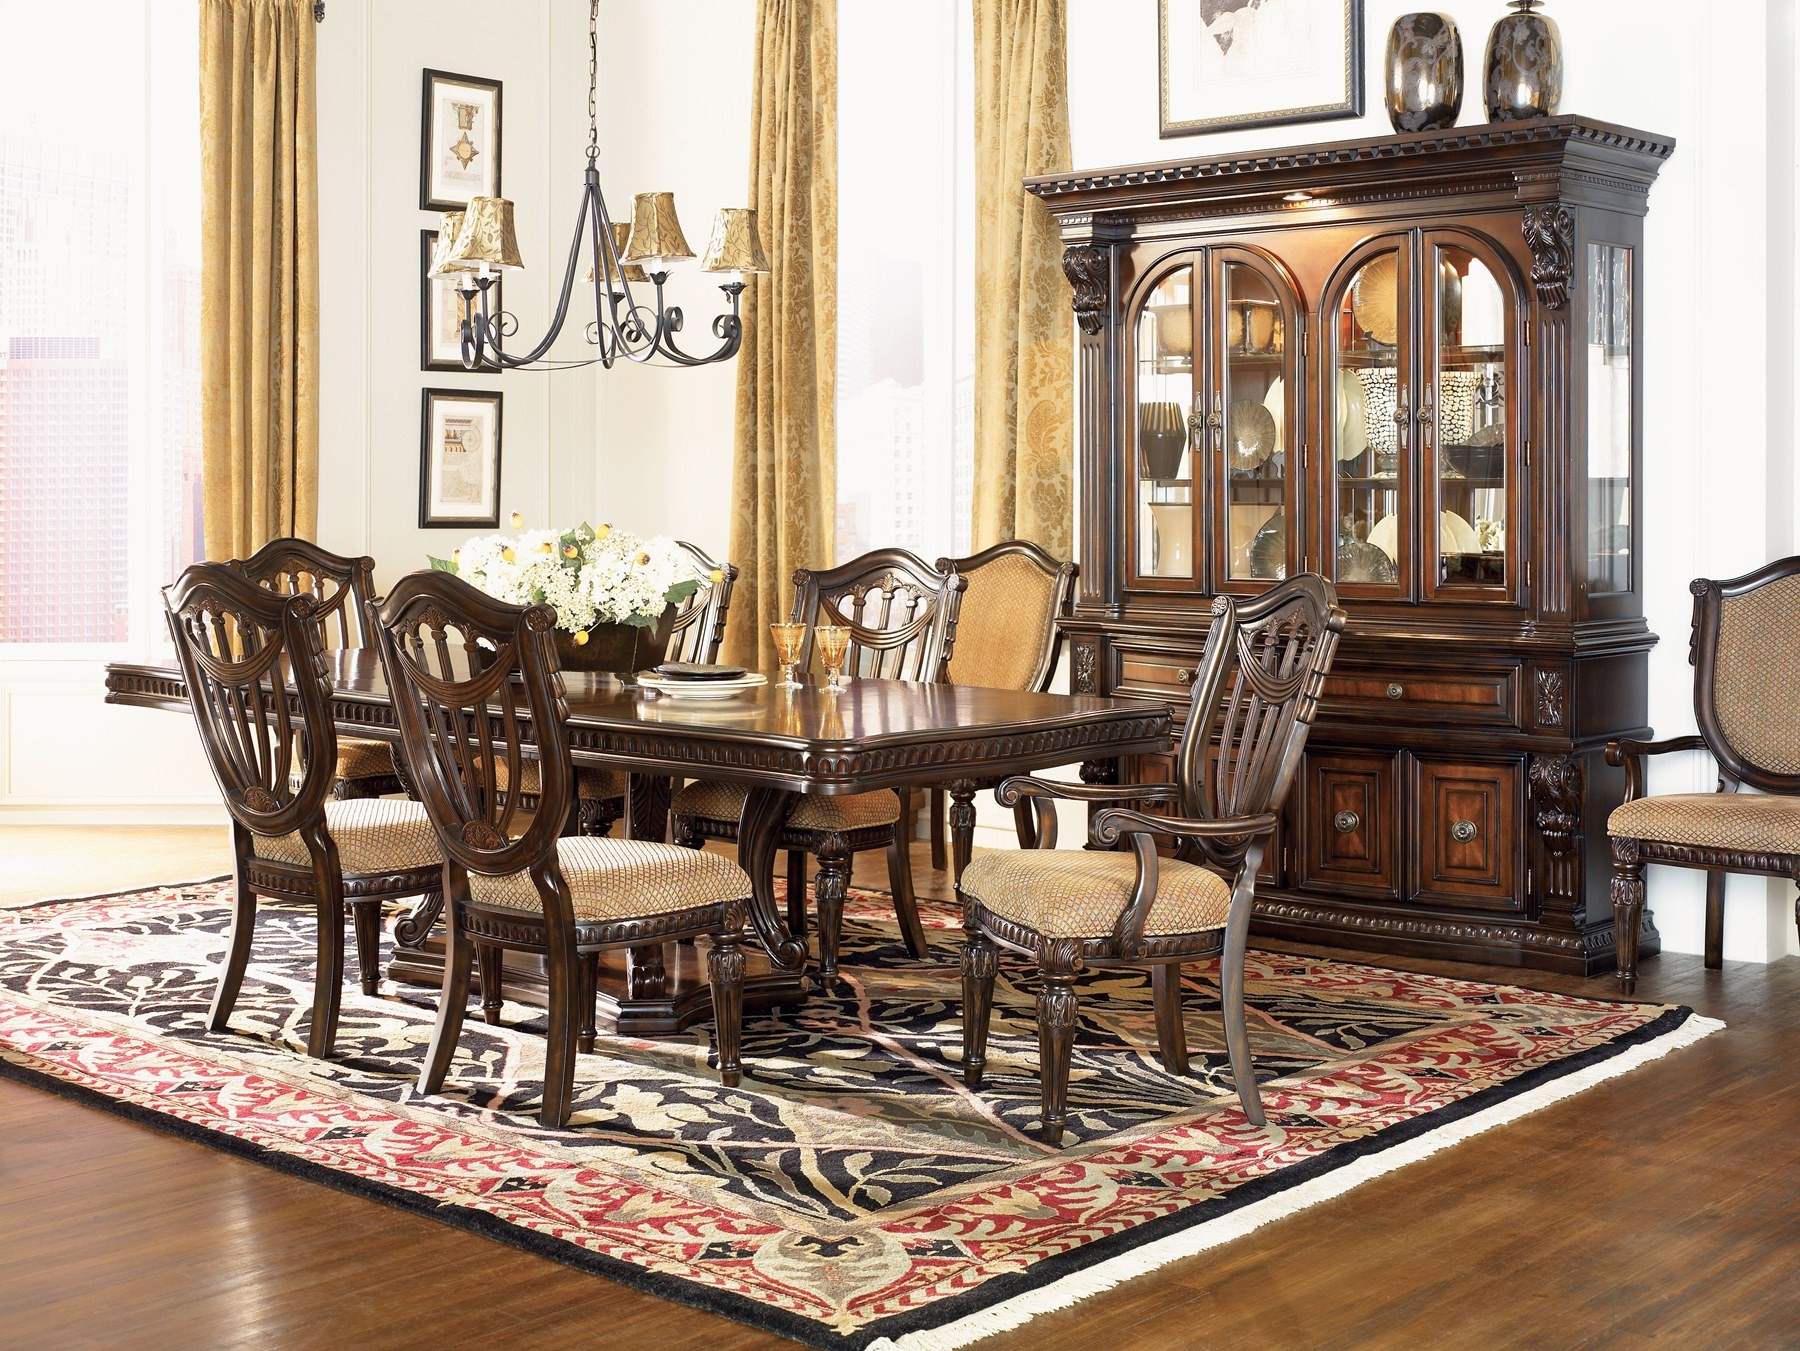 Fairmont Designs Grand Estates Dining Room Set with Double  : grandeestatesdiningwood2 from colemanfurniture.com size 1800 x 1351 jpeg 768kB